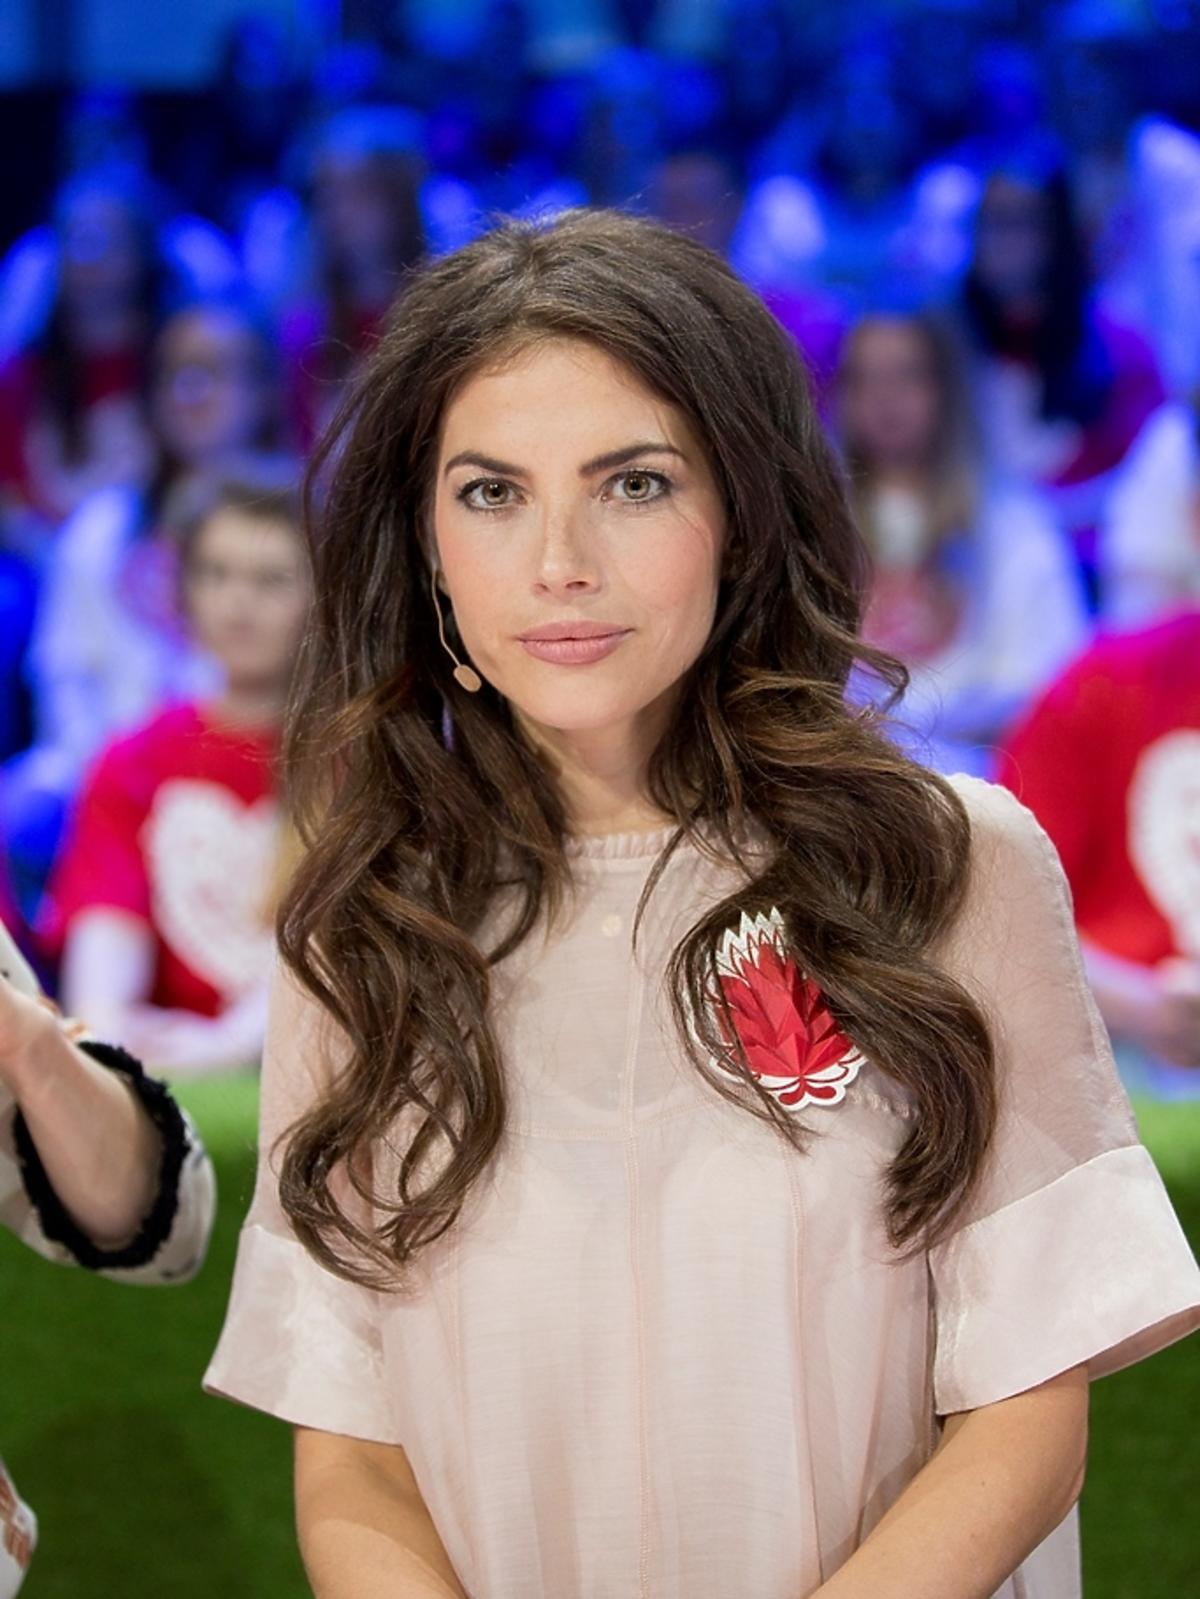 Weronika Rosati, Kocham Cię Polsko